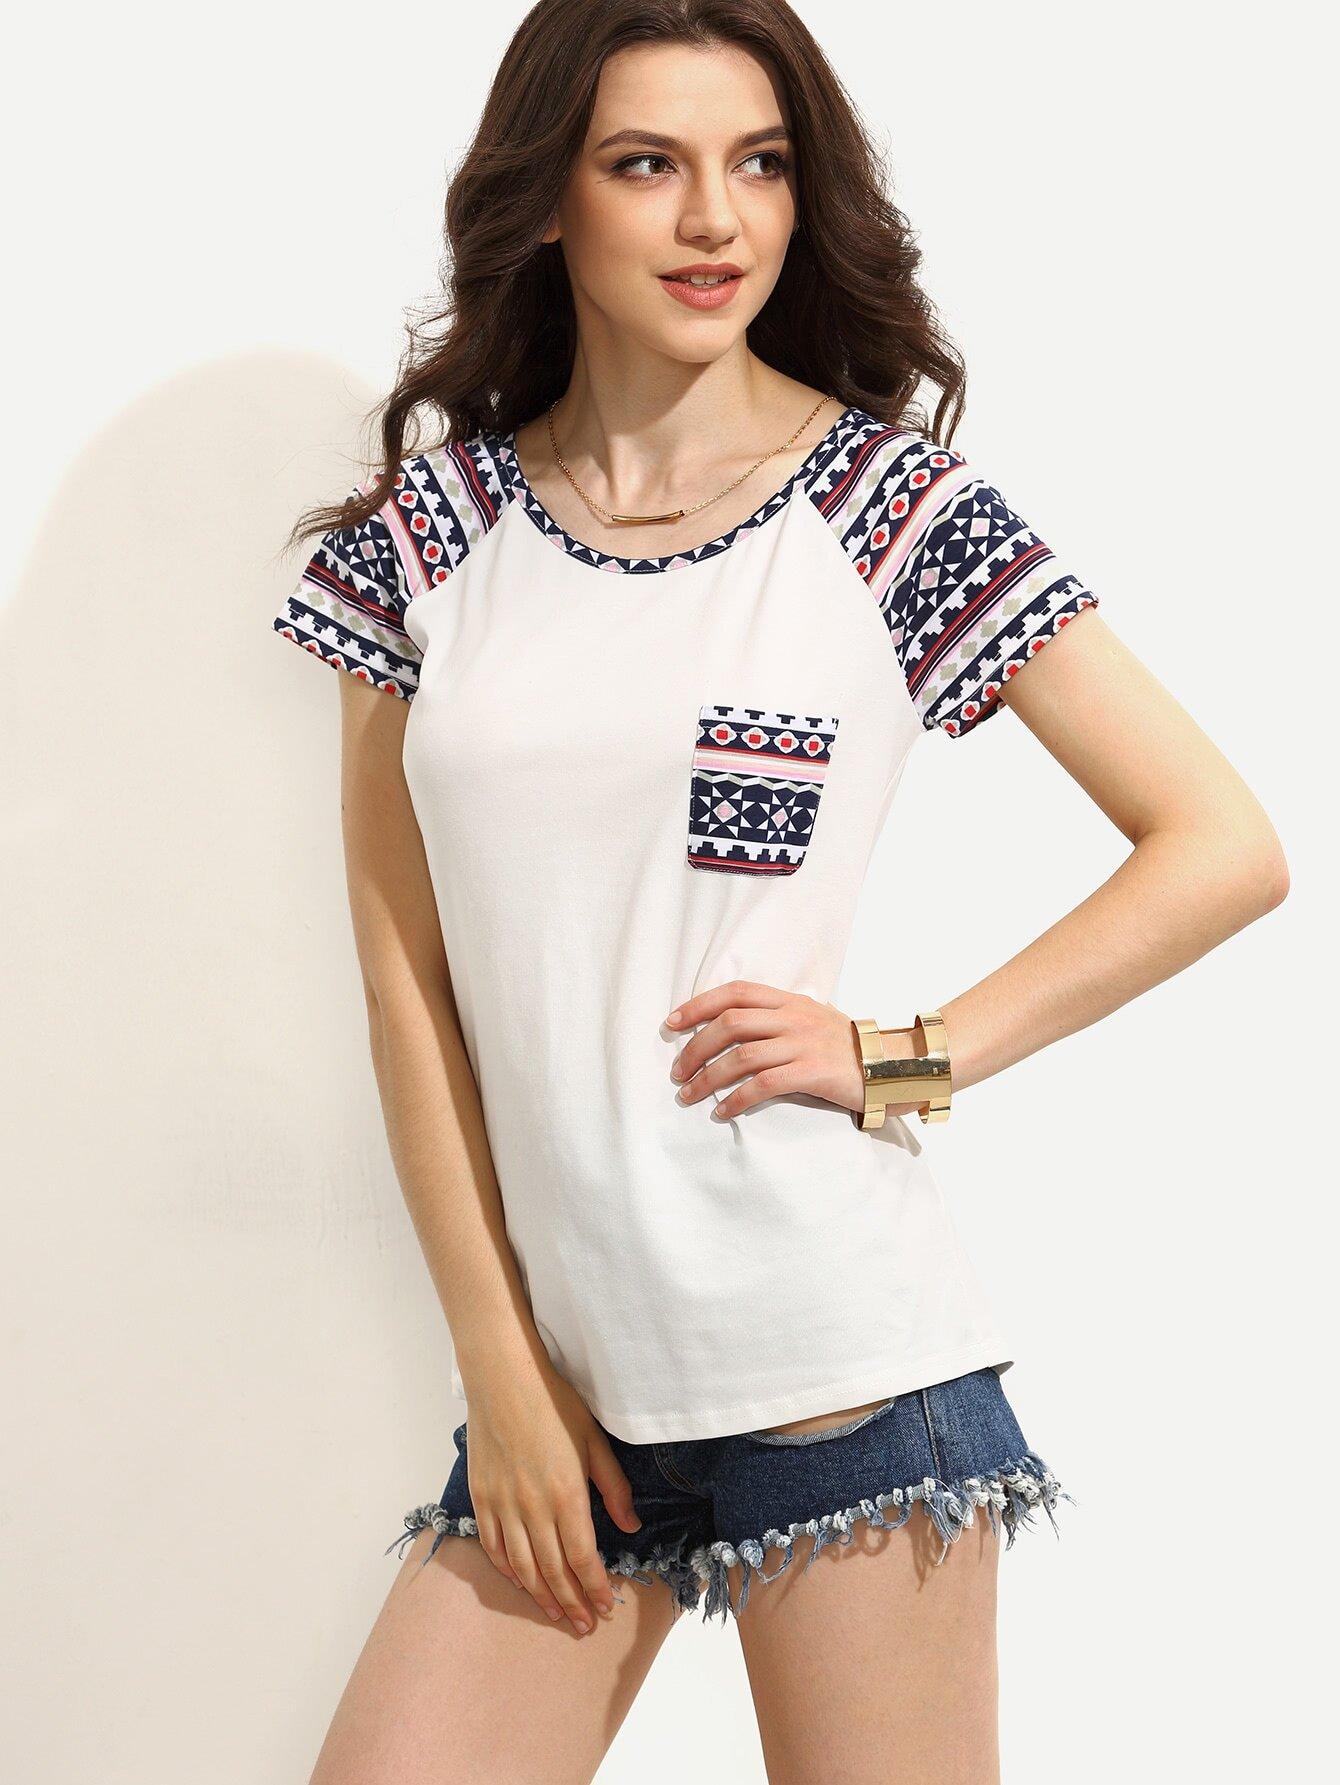 White Print Short Sleeve T-shirtWhite Print Short Sleeve T-shirt<br><br>color: White<br>size: L,M,S,XS